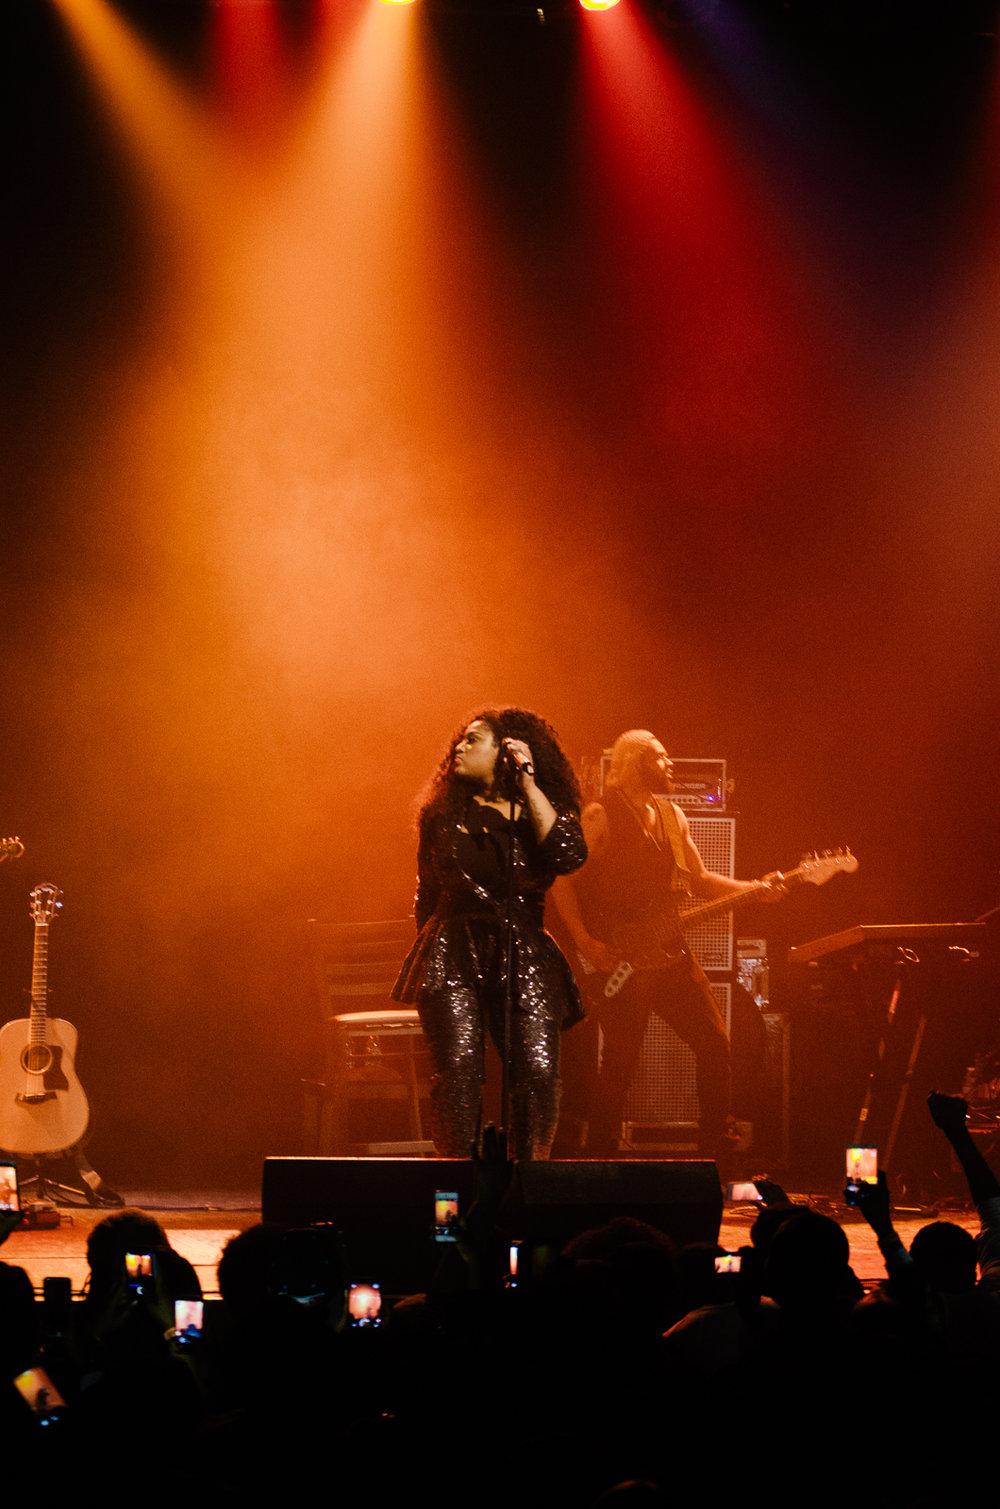 jazmine-sullivan-reality-show-tour-atlanta-508-hires-web.jpg